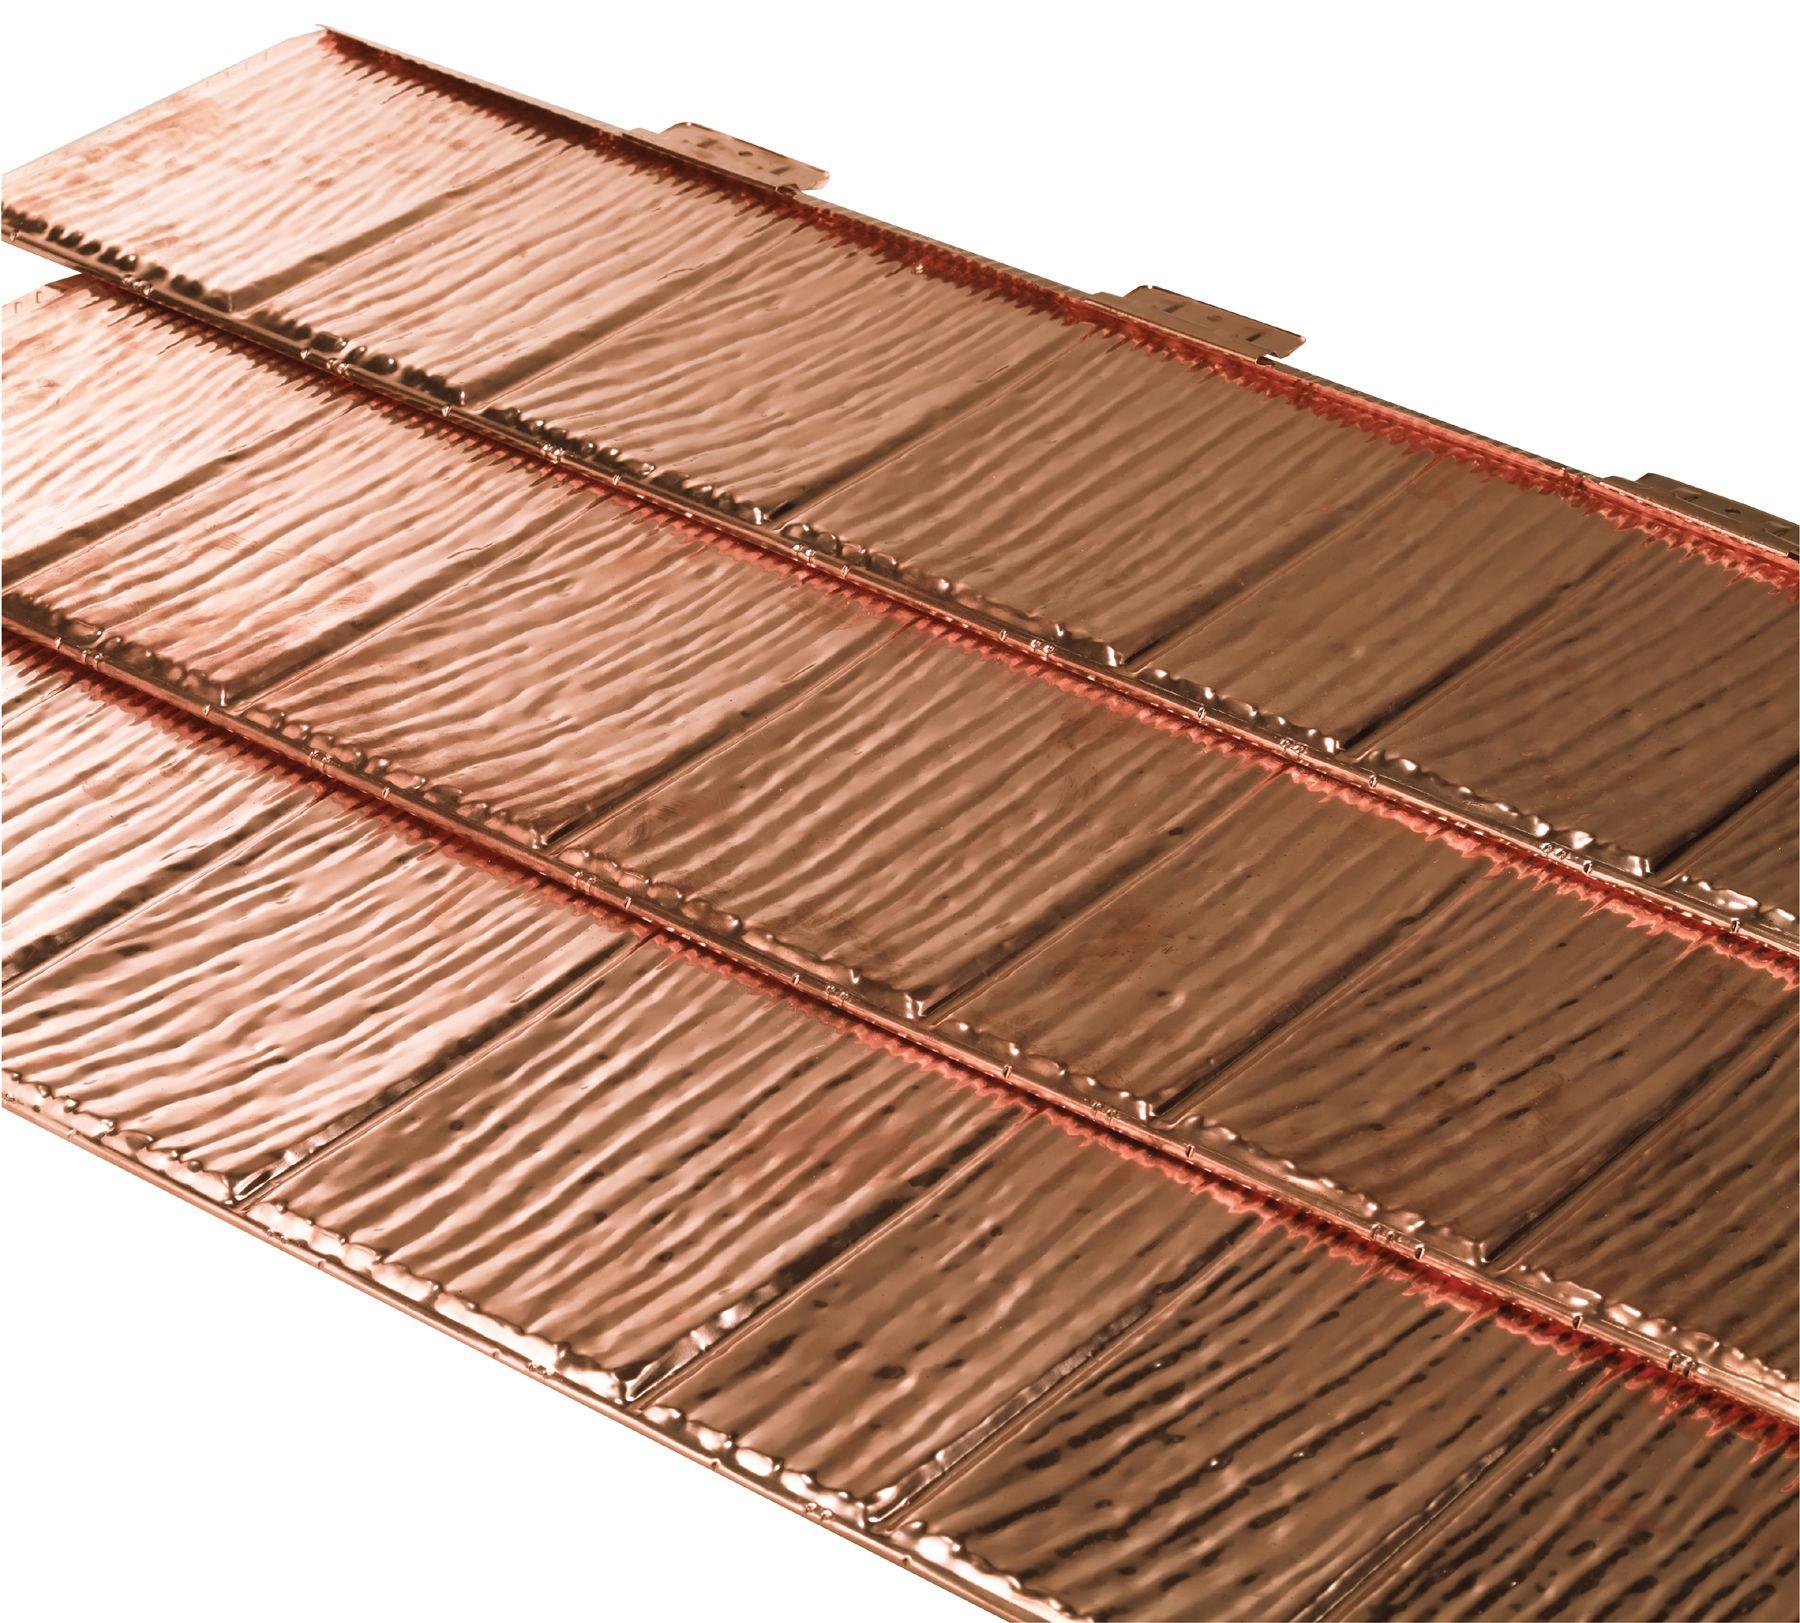 Copper Metal Shingles Roof Google Search Metal Shingle